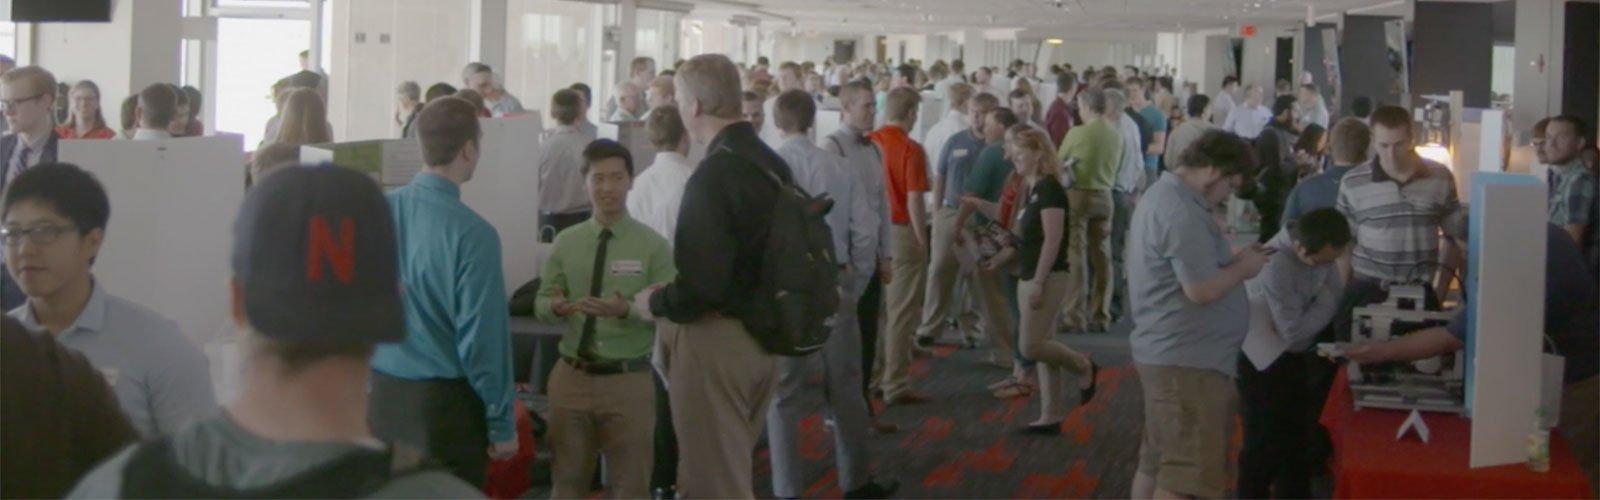 People attending the Senior Design Showcase